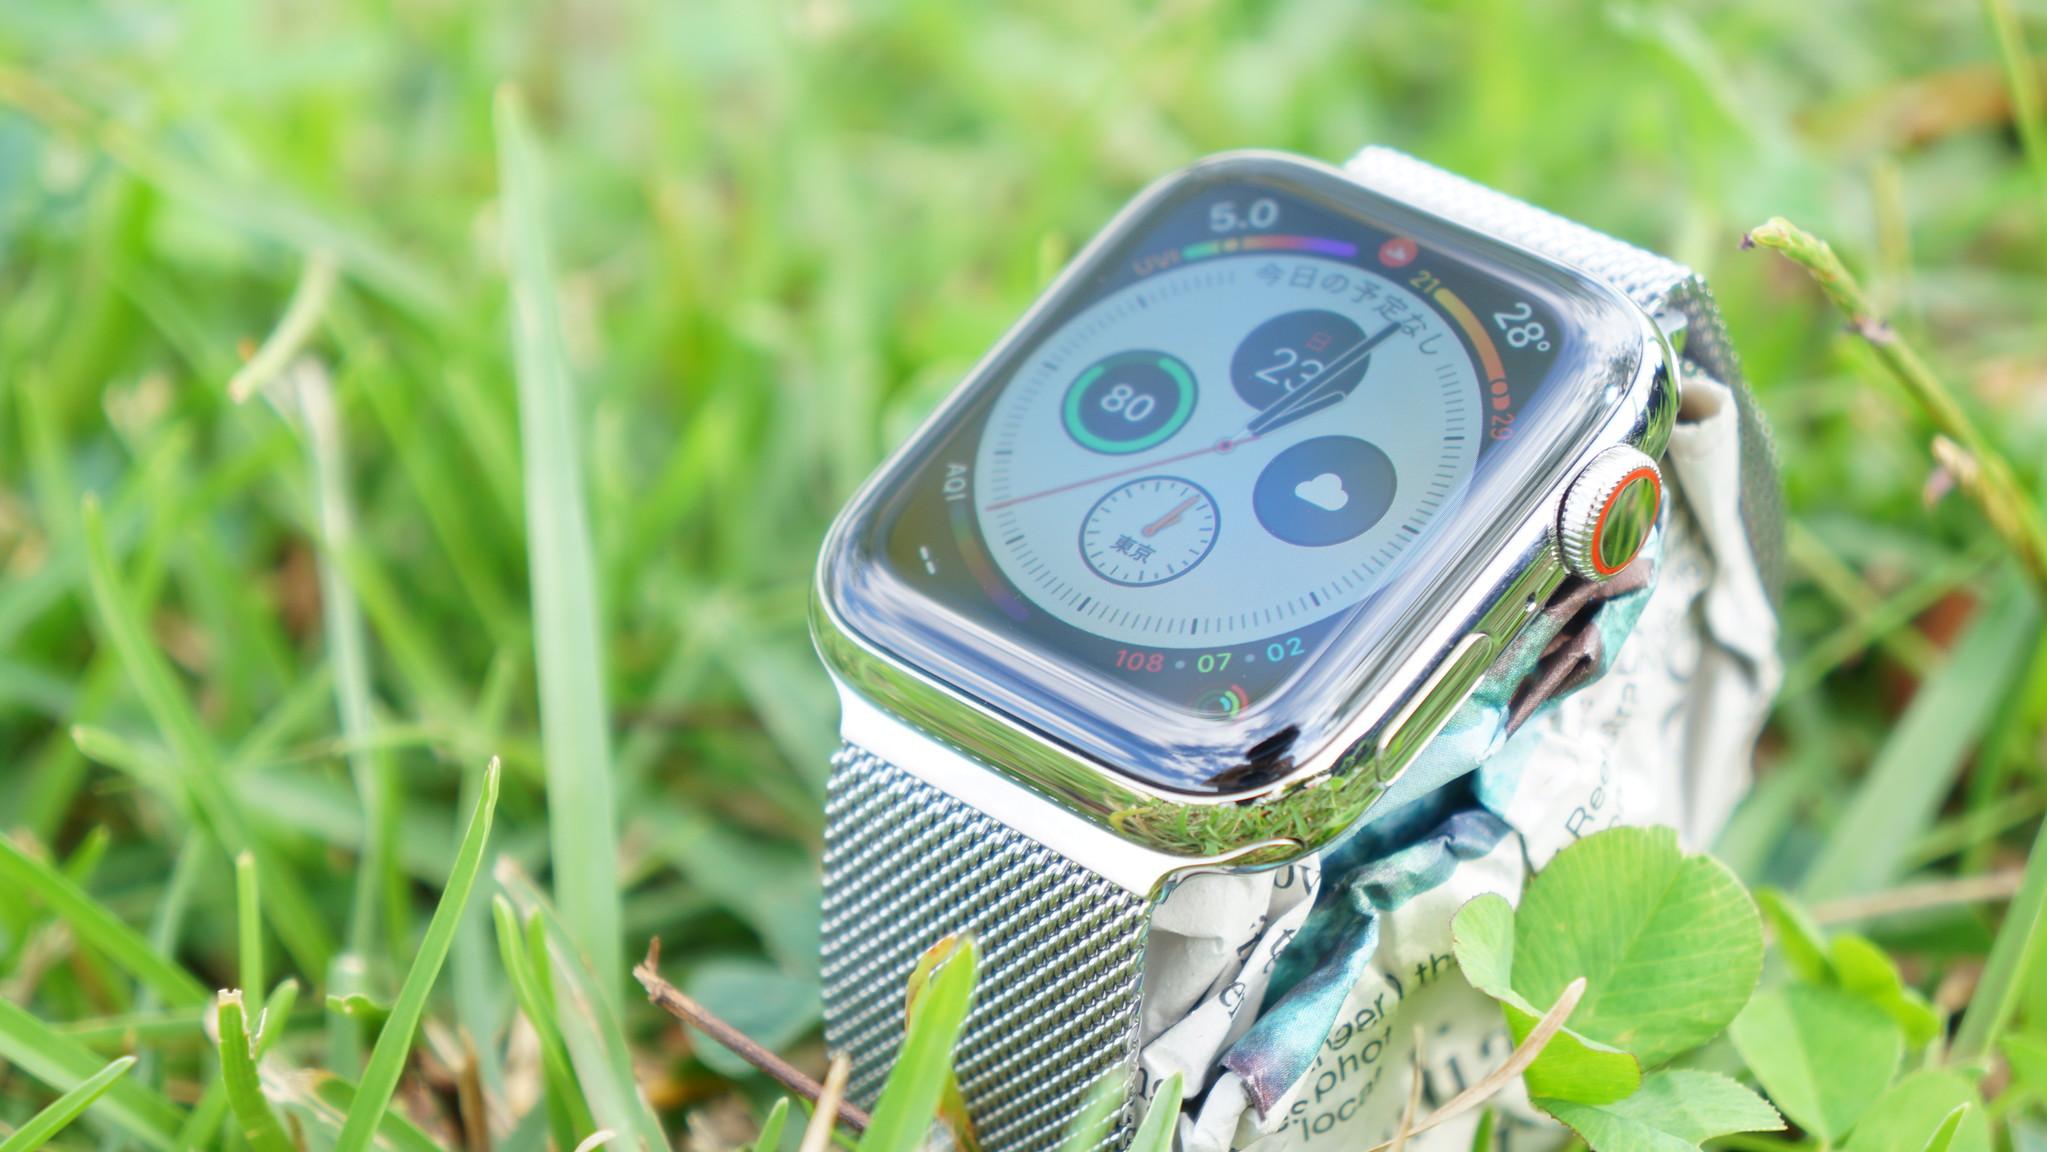 「watchOS 6」 の新機能と変更点の一部が明らかに